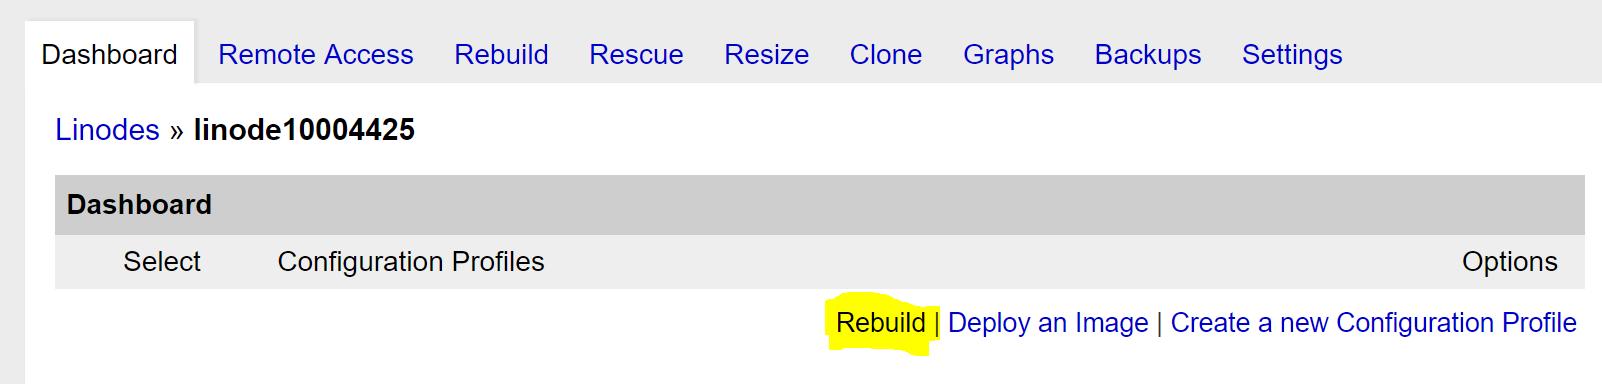 Rebuild the Linode